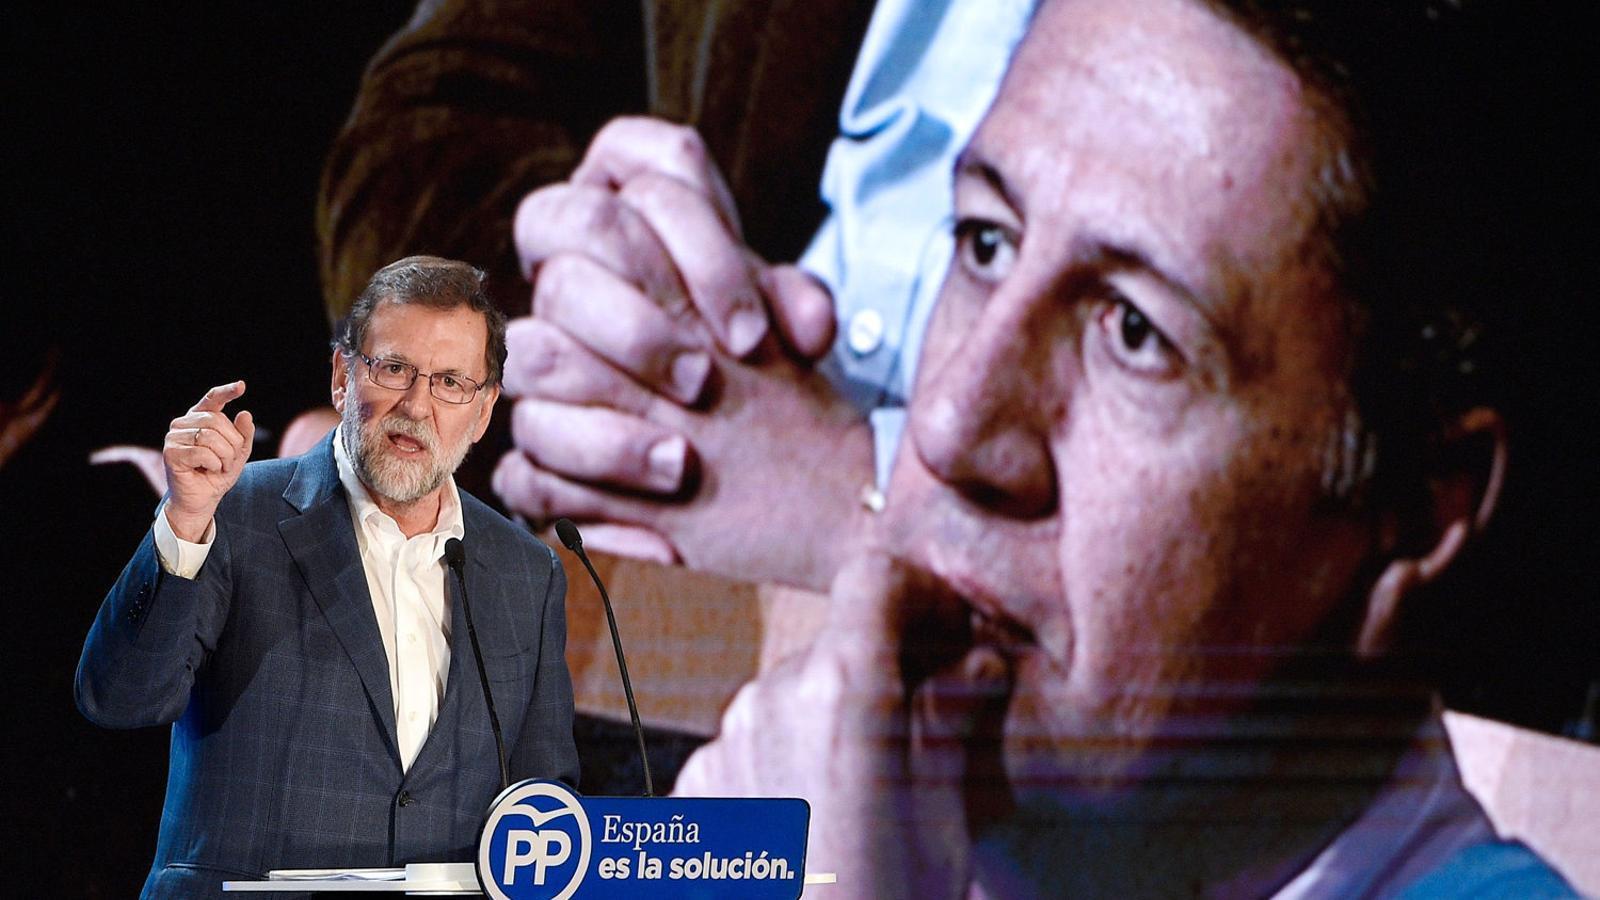 El president del govern espanyol, Mariano Rajoy, va donar suport a Xavier García Albiol ahir a Salou.